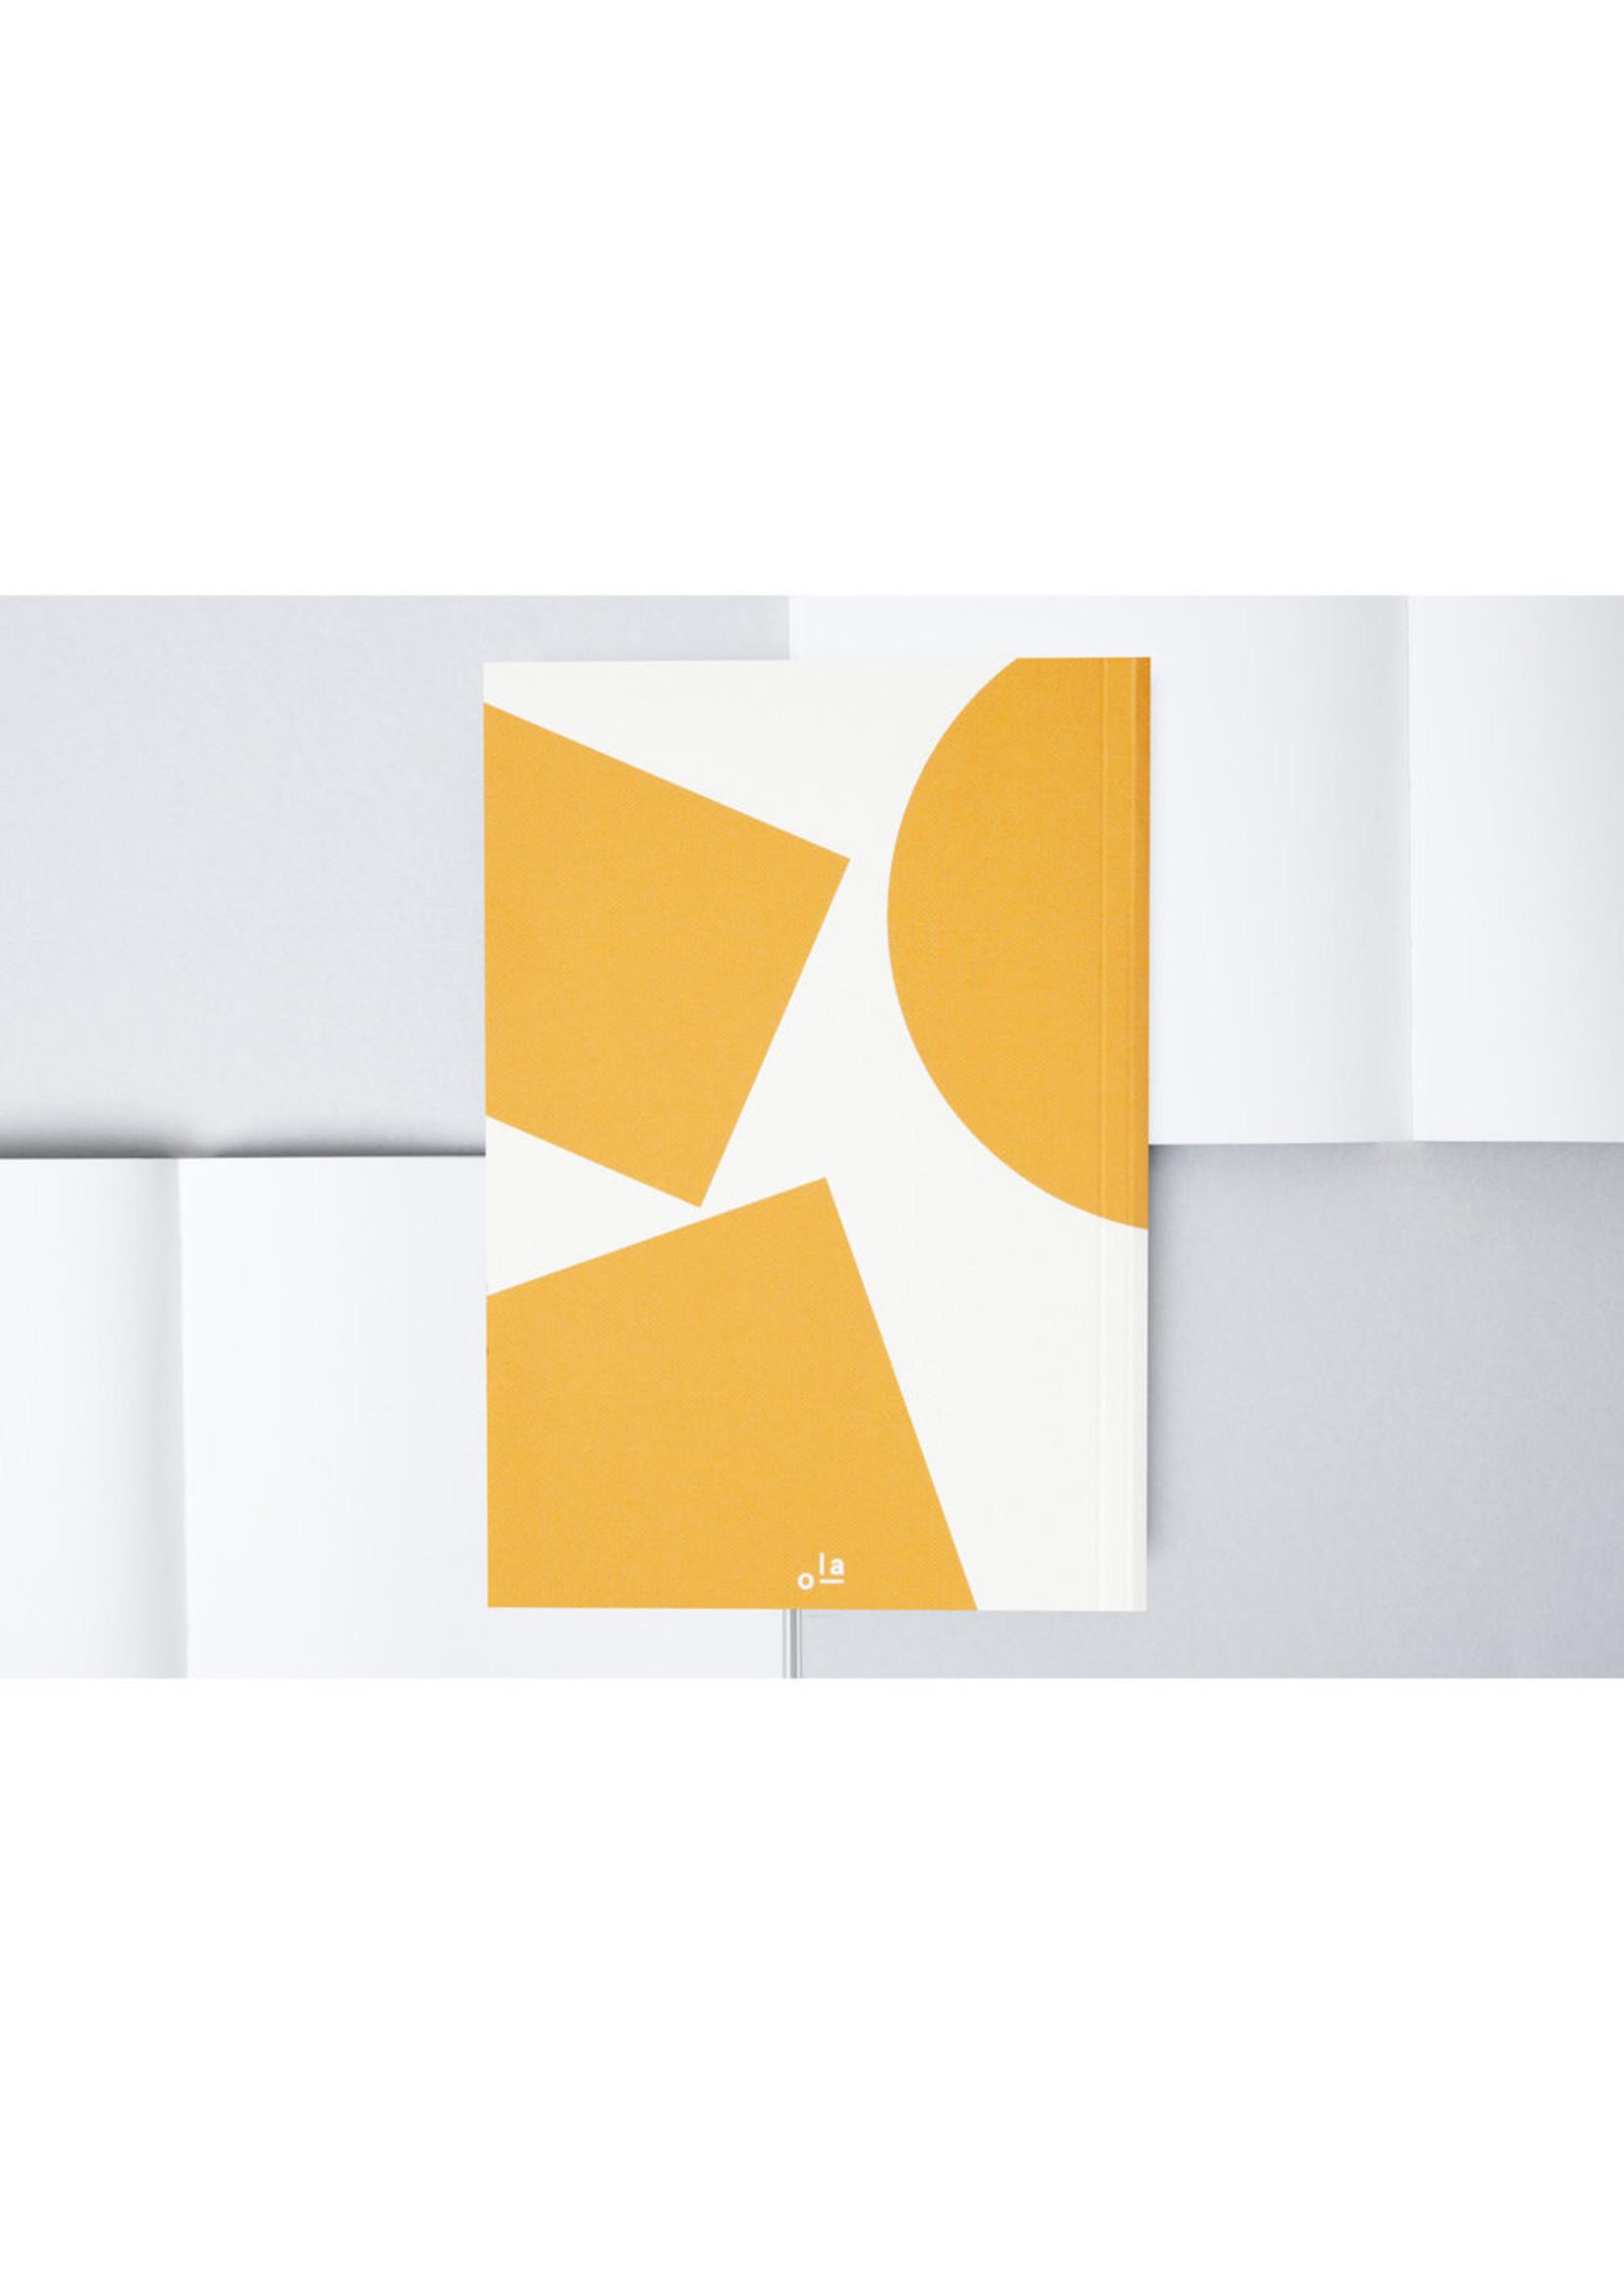 Ola Ola, Limited Edition Medium Layflat Weekly Planner, Blocks Print in Mustard - Calendar Insert: 2021/2022